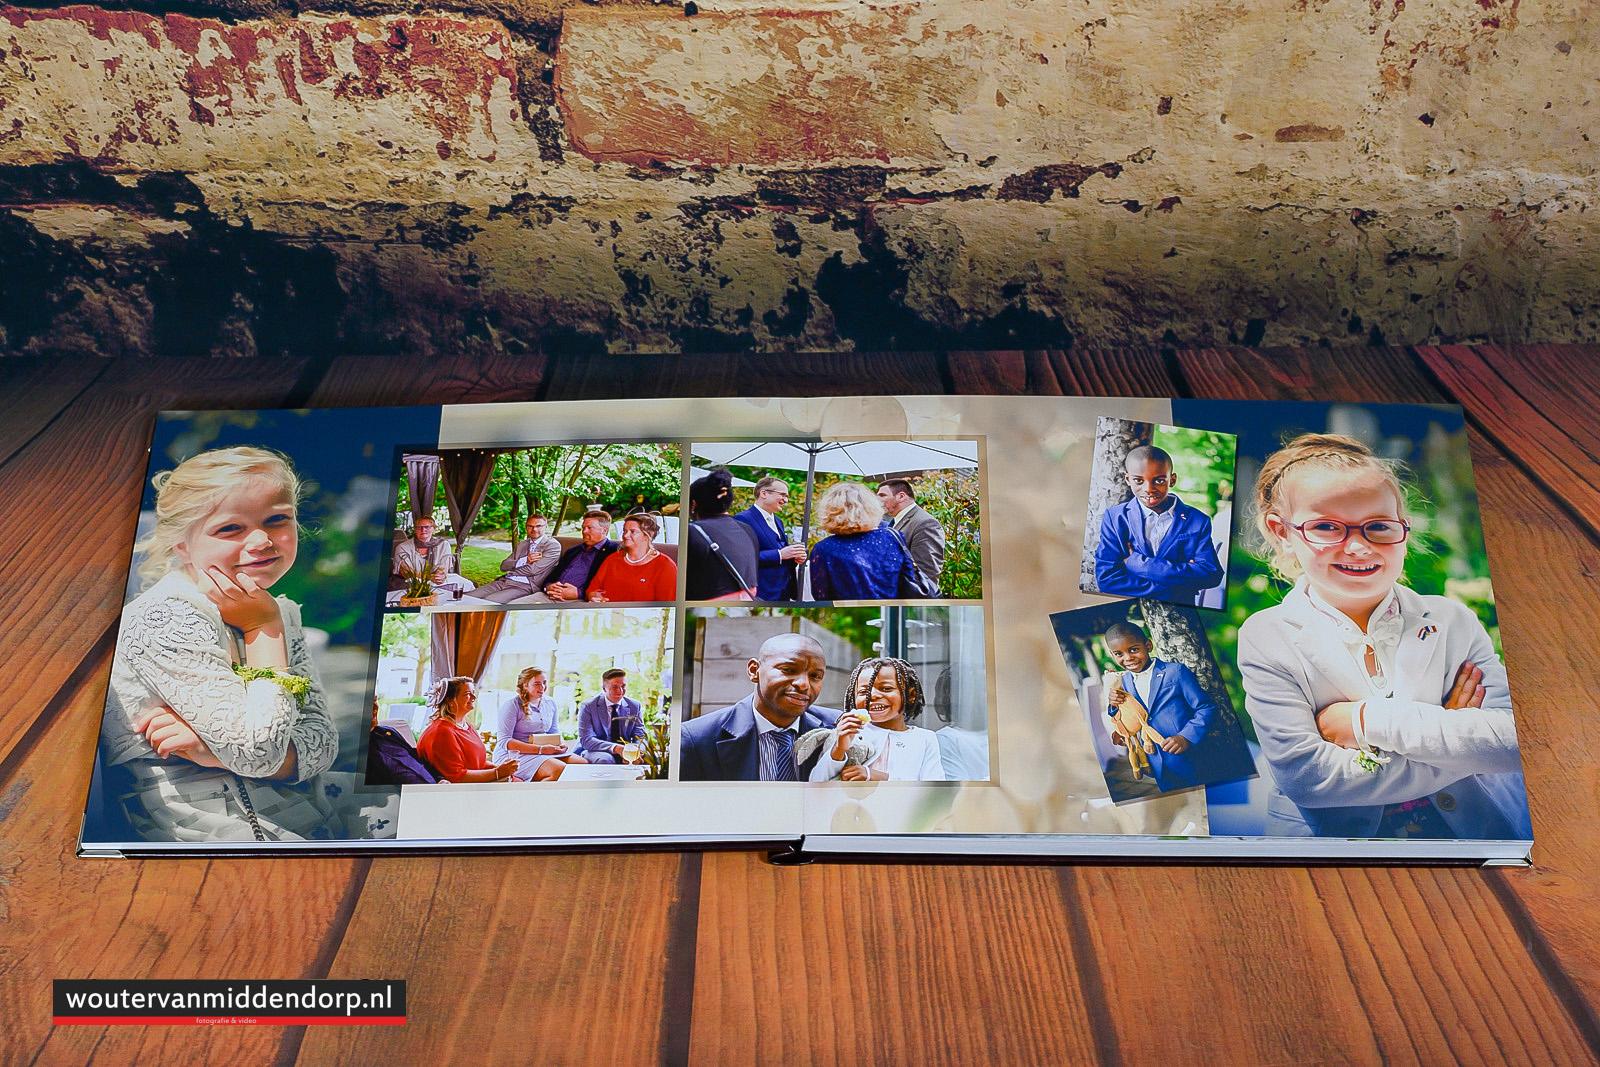 trouwalbum, bruidsreportage, trouwfotograaf, groepsfoto, fotograaf, Wouter van Middendorp, Veluwe, Uddel, Lunteren, (3)